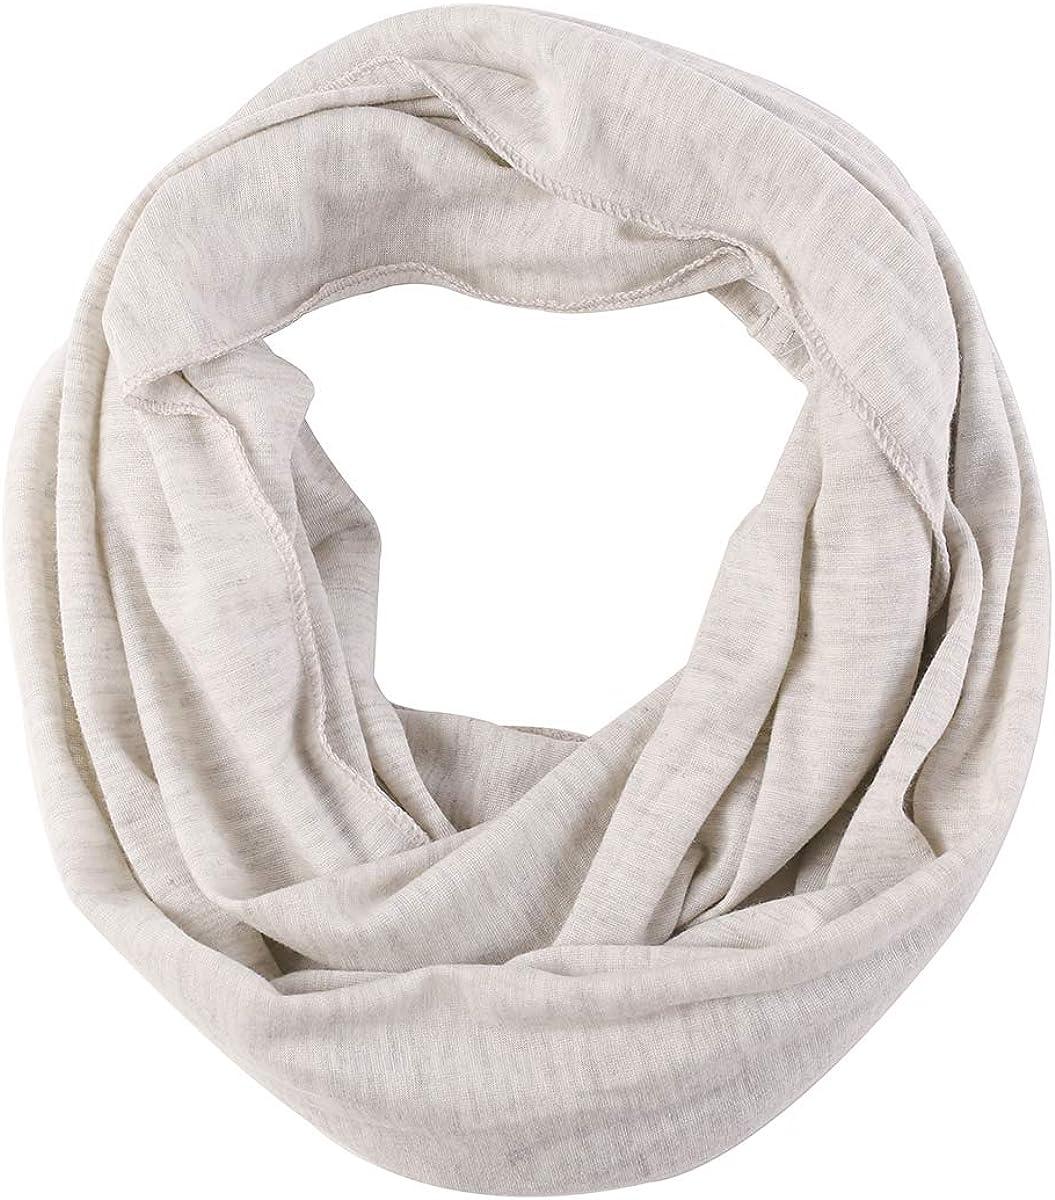 Toddler Baby Girls Boys Jersey Infinity scarf Cozy Soft Fashion stylish